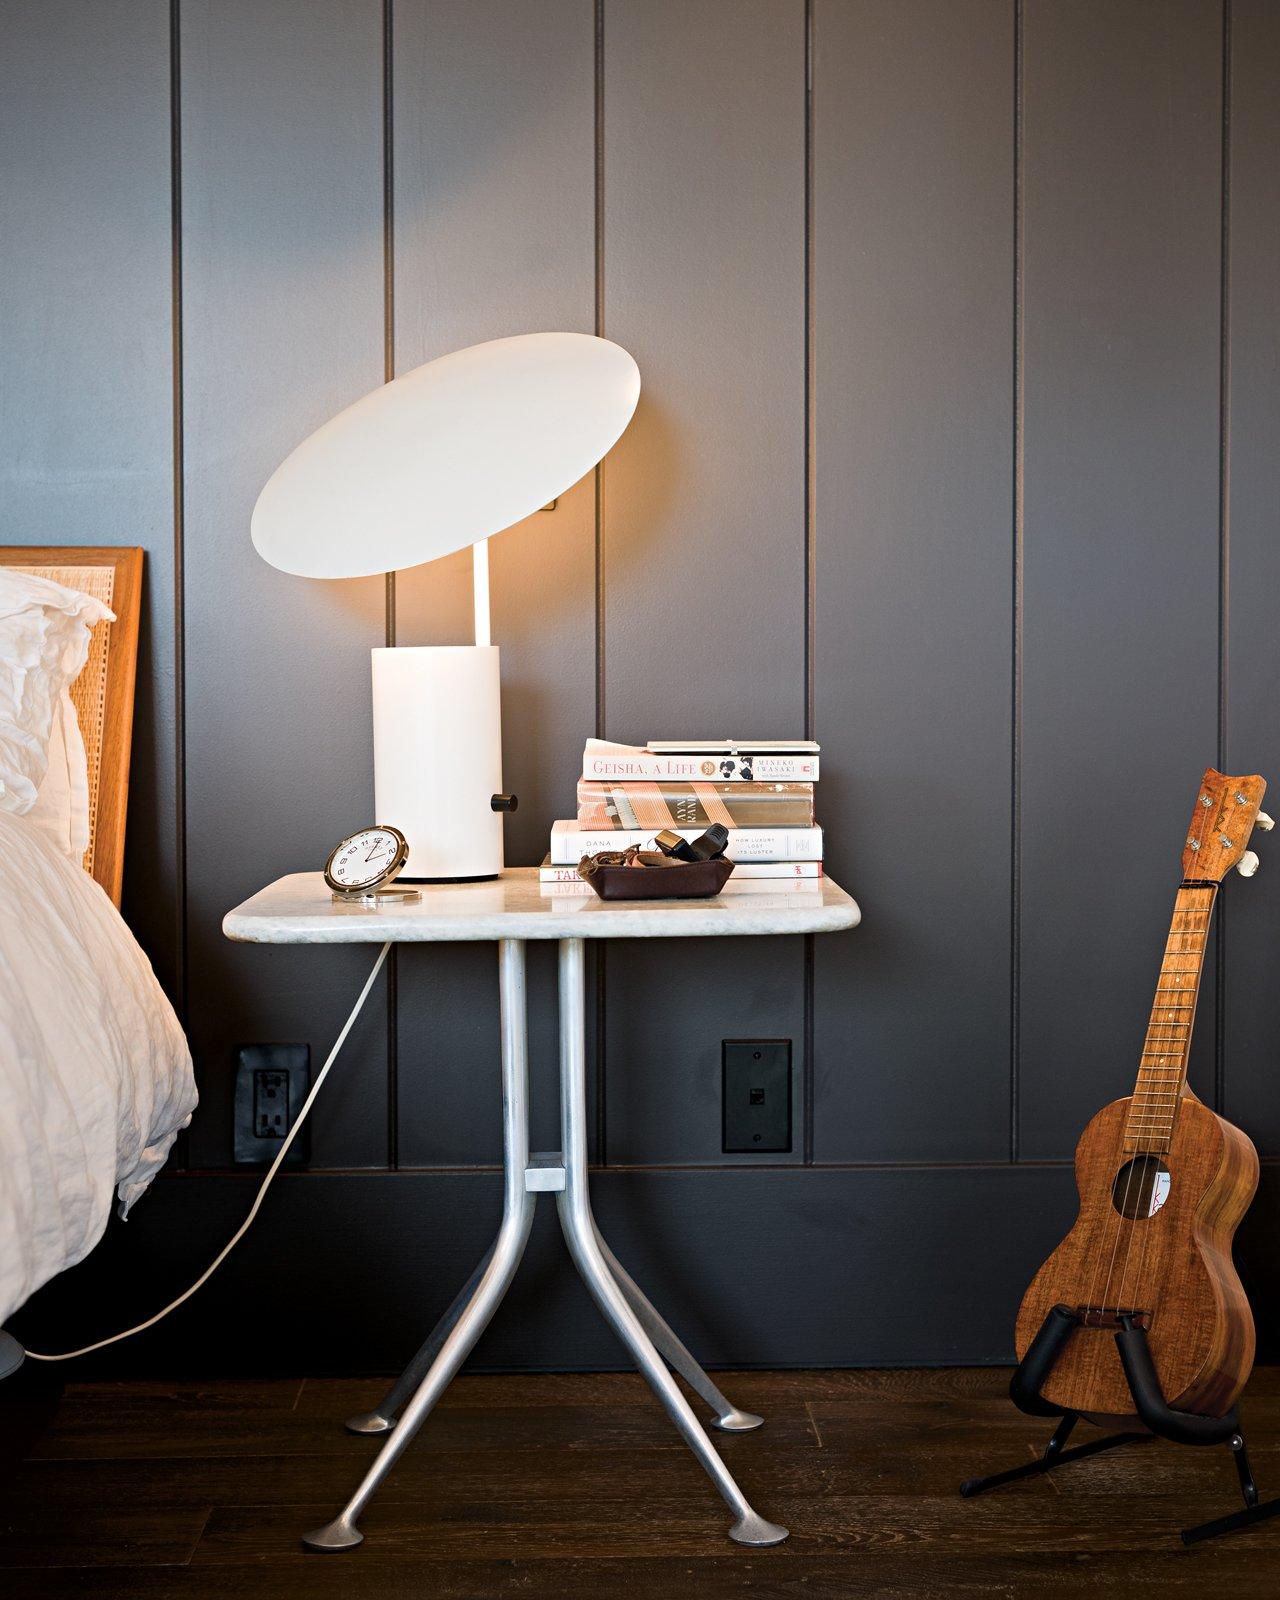 #georgenelson #halfnelsonlamp #lamp #sidetable #lighting #interior #modern  60+ Modern Lighting Solutions by Dwell